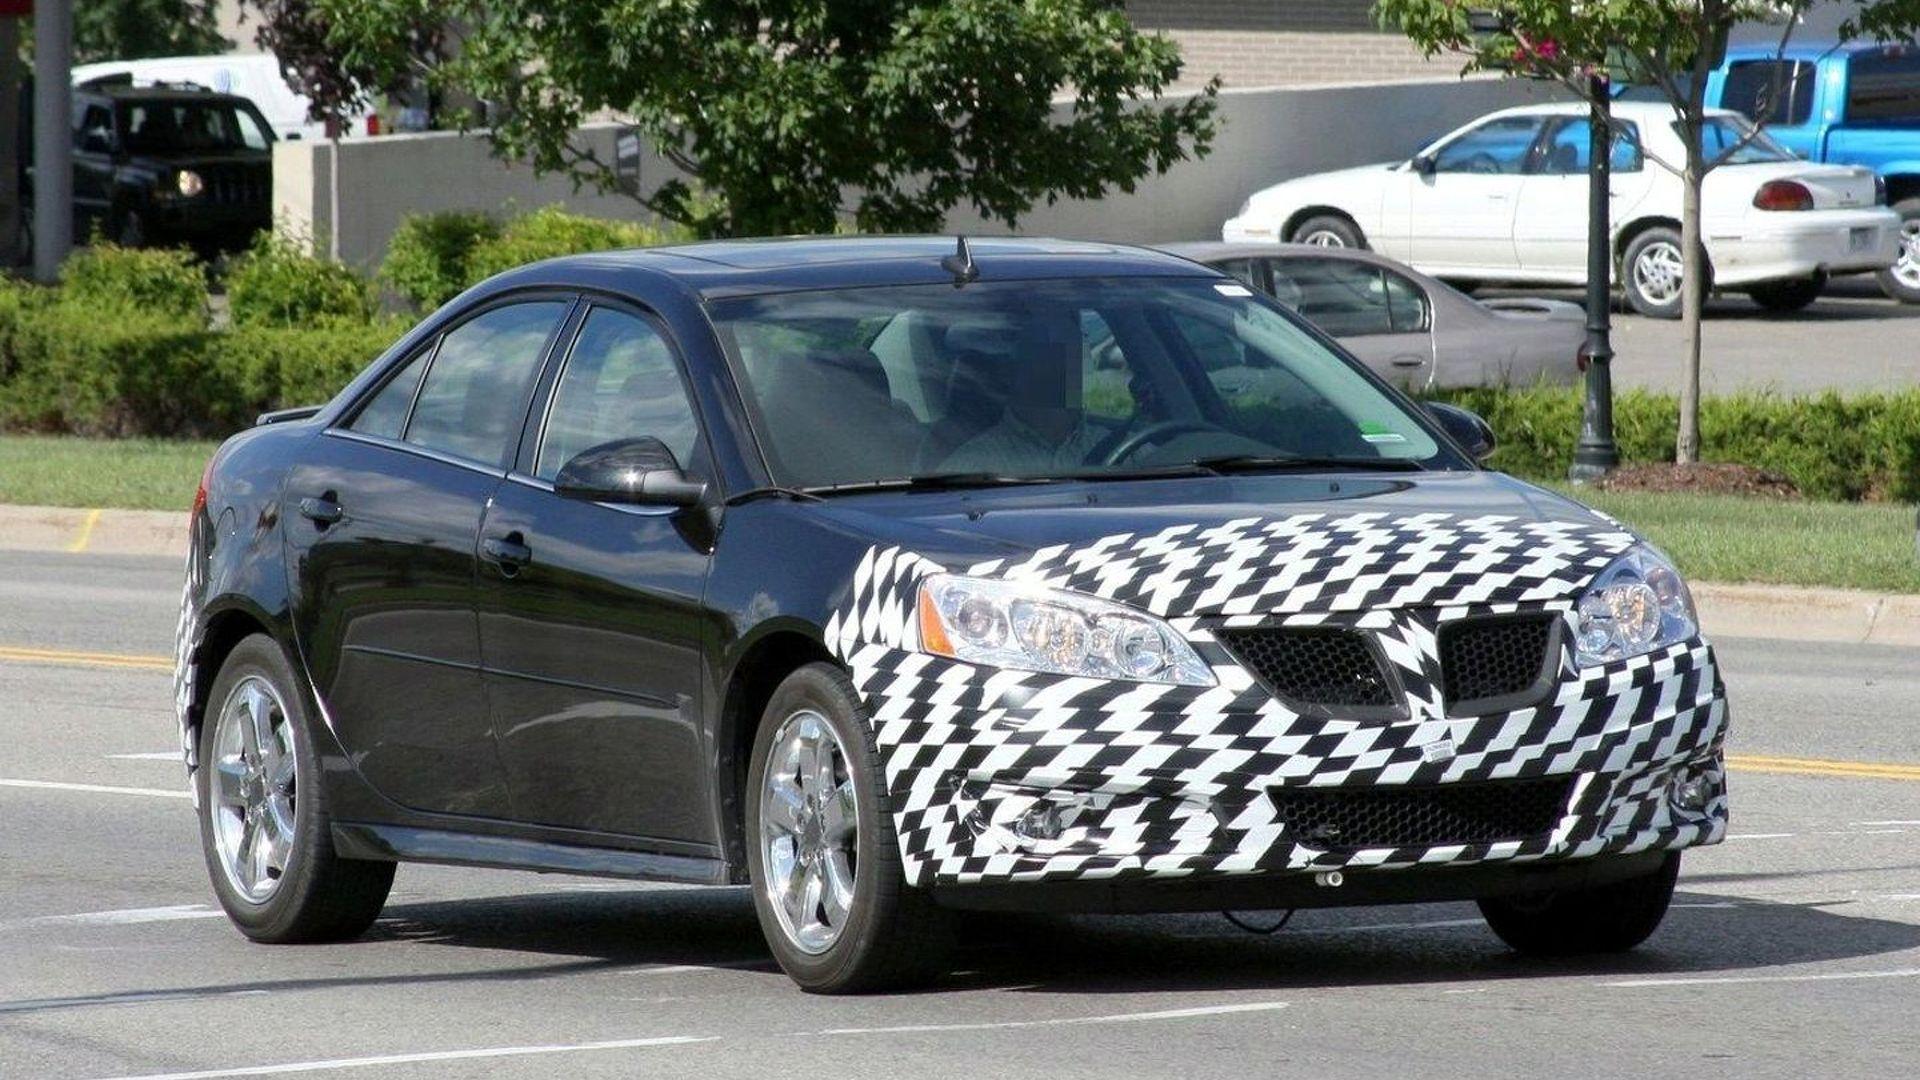 Pontiac G6 Facelift Spied